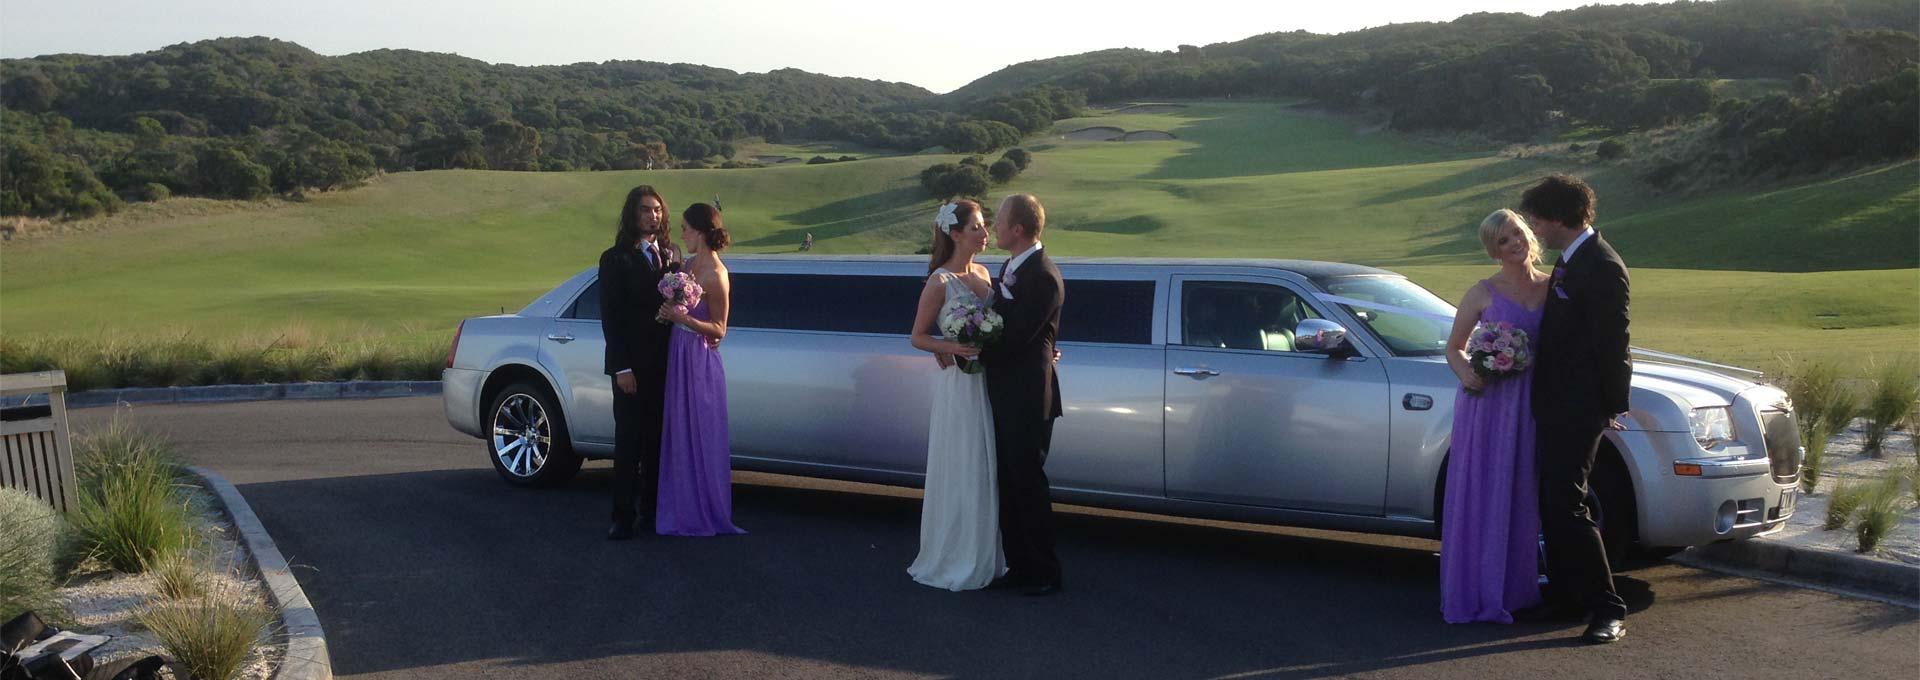 slide-wedding-limo-hire